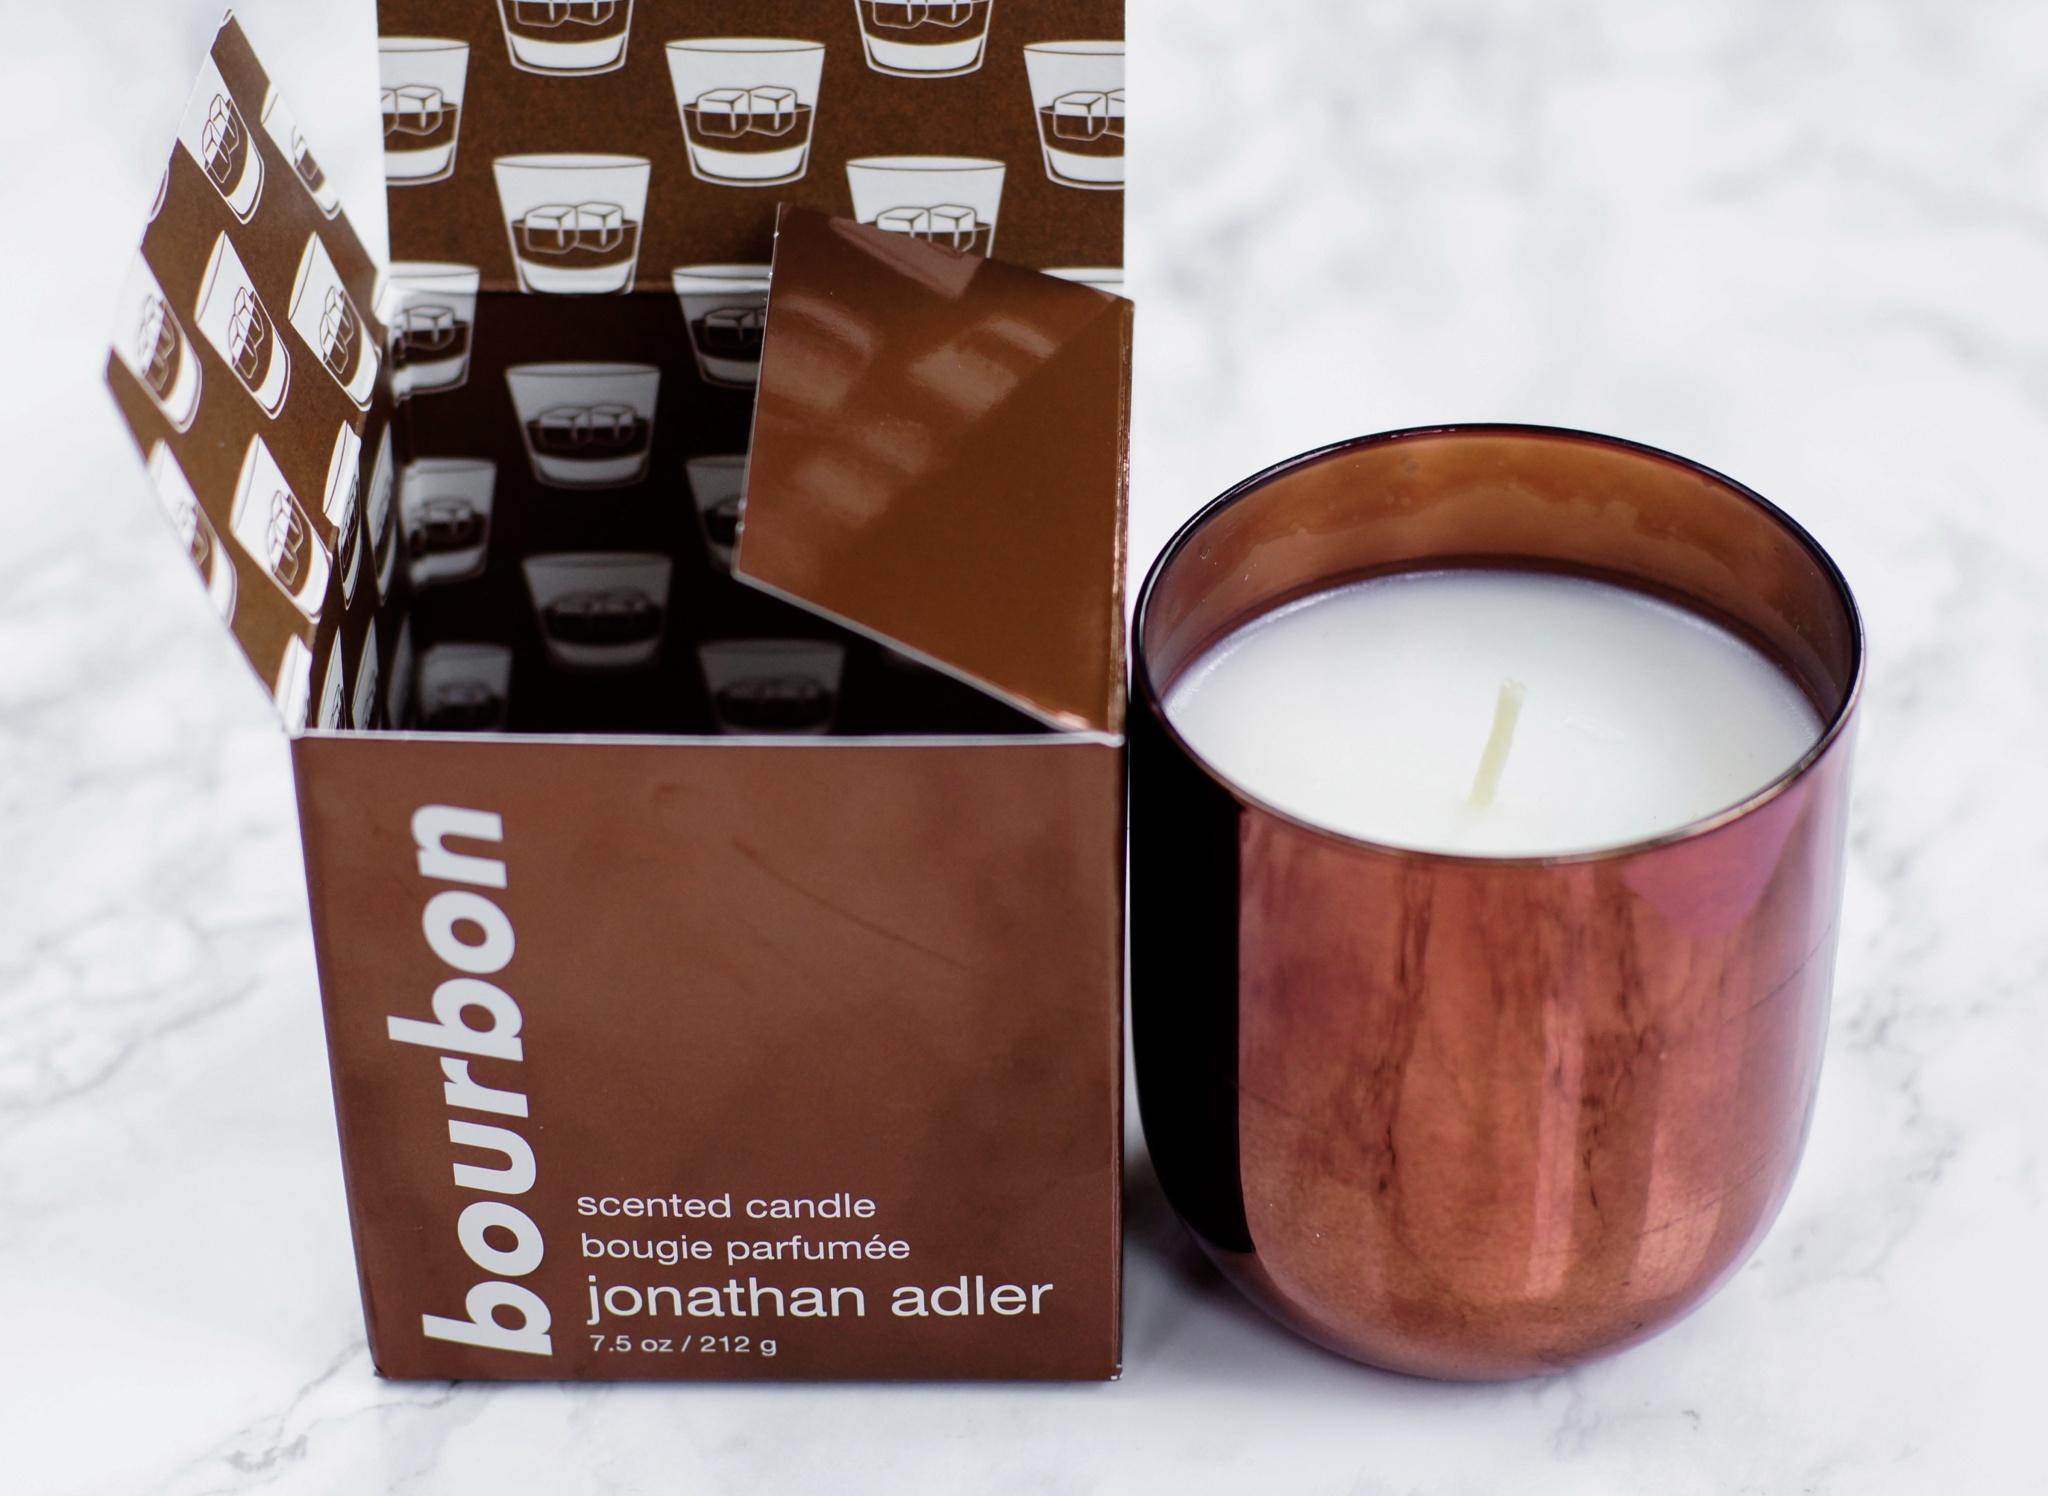 - Jonathan Adler Bourbon Candle - Bourbon Scented - Bourbon Pop Candle - JA's World - Decor - jonathanadler.com - TheKillerLook.com - The Killer Look